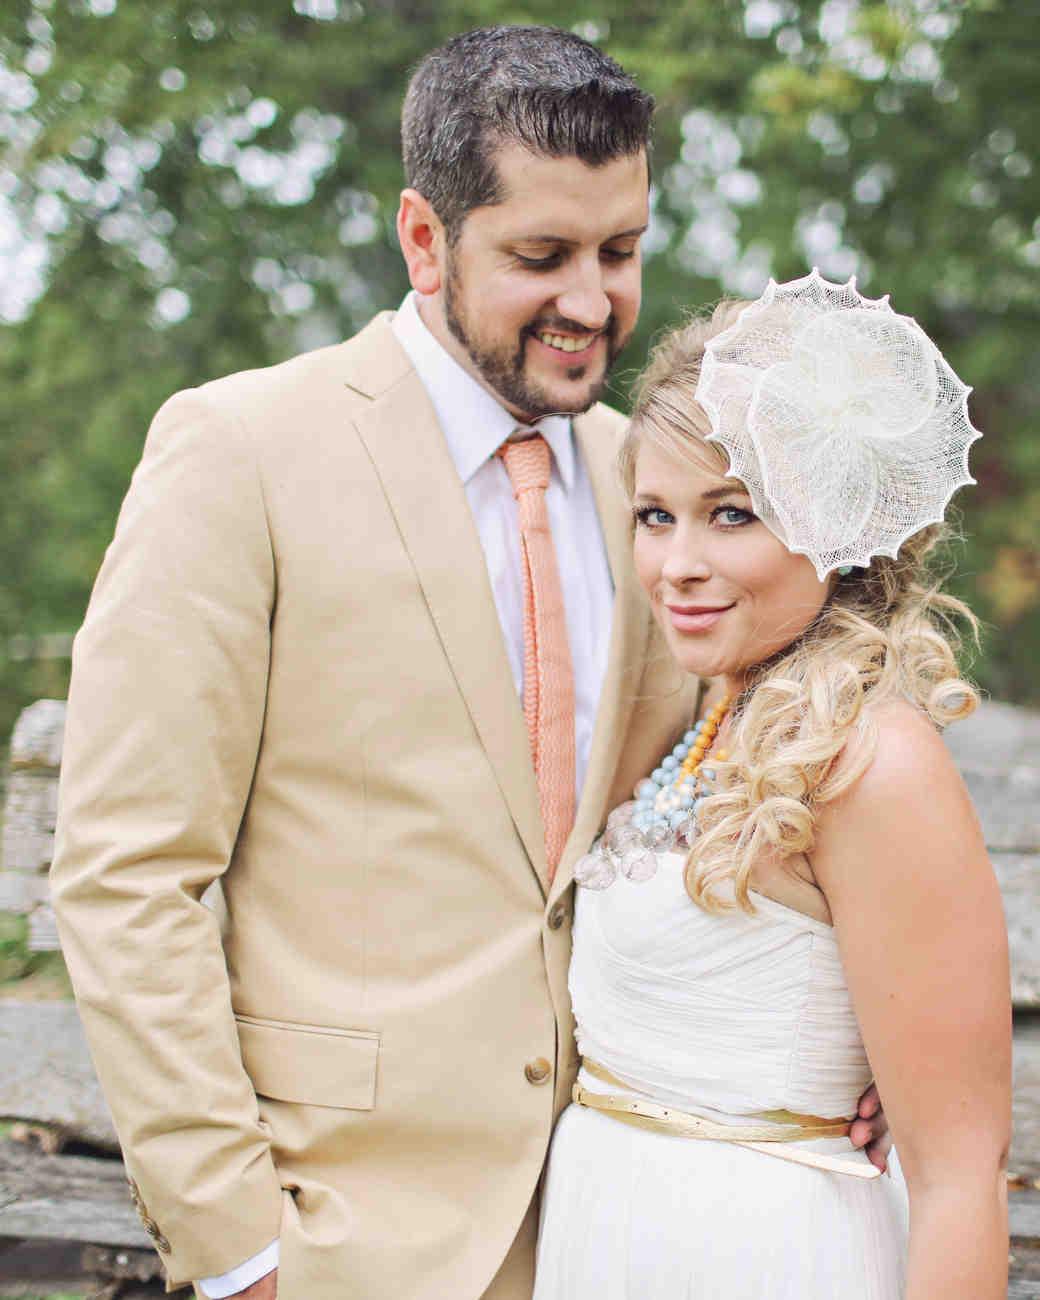 real-weddings-nichole-matthew-wd0413-124.jpg